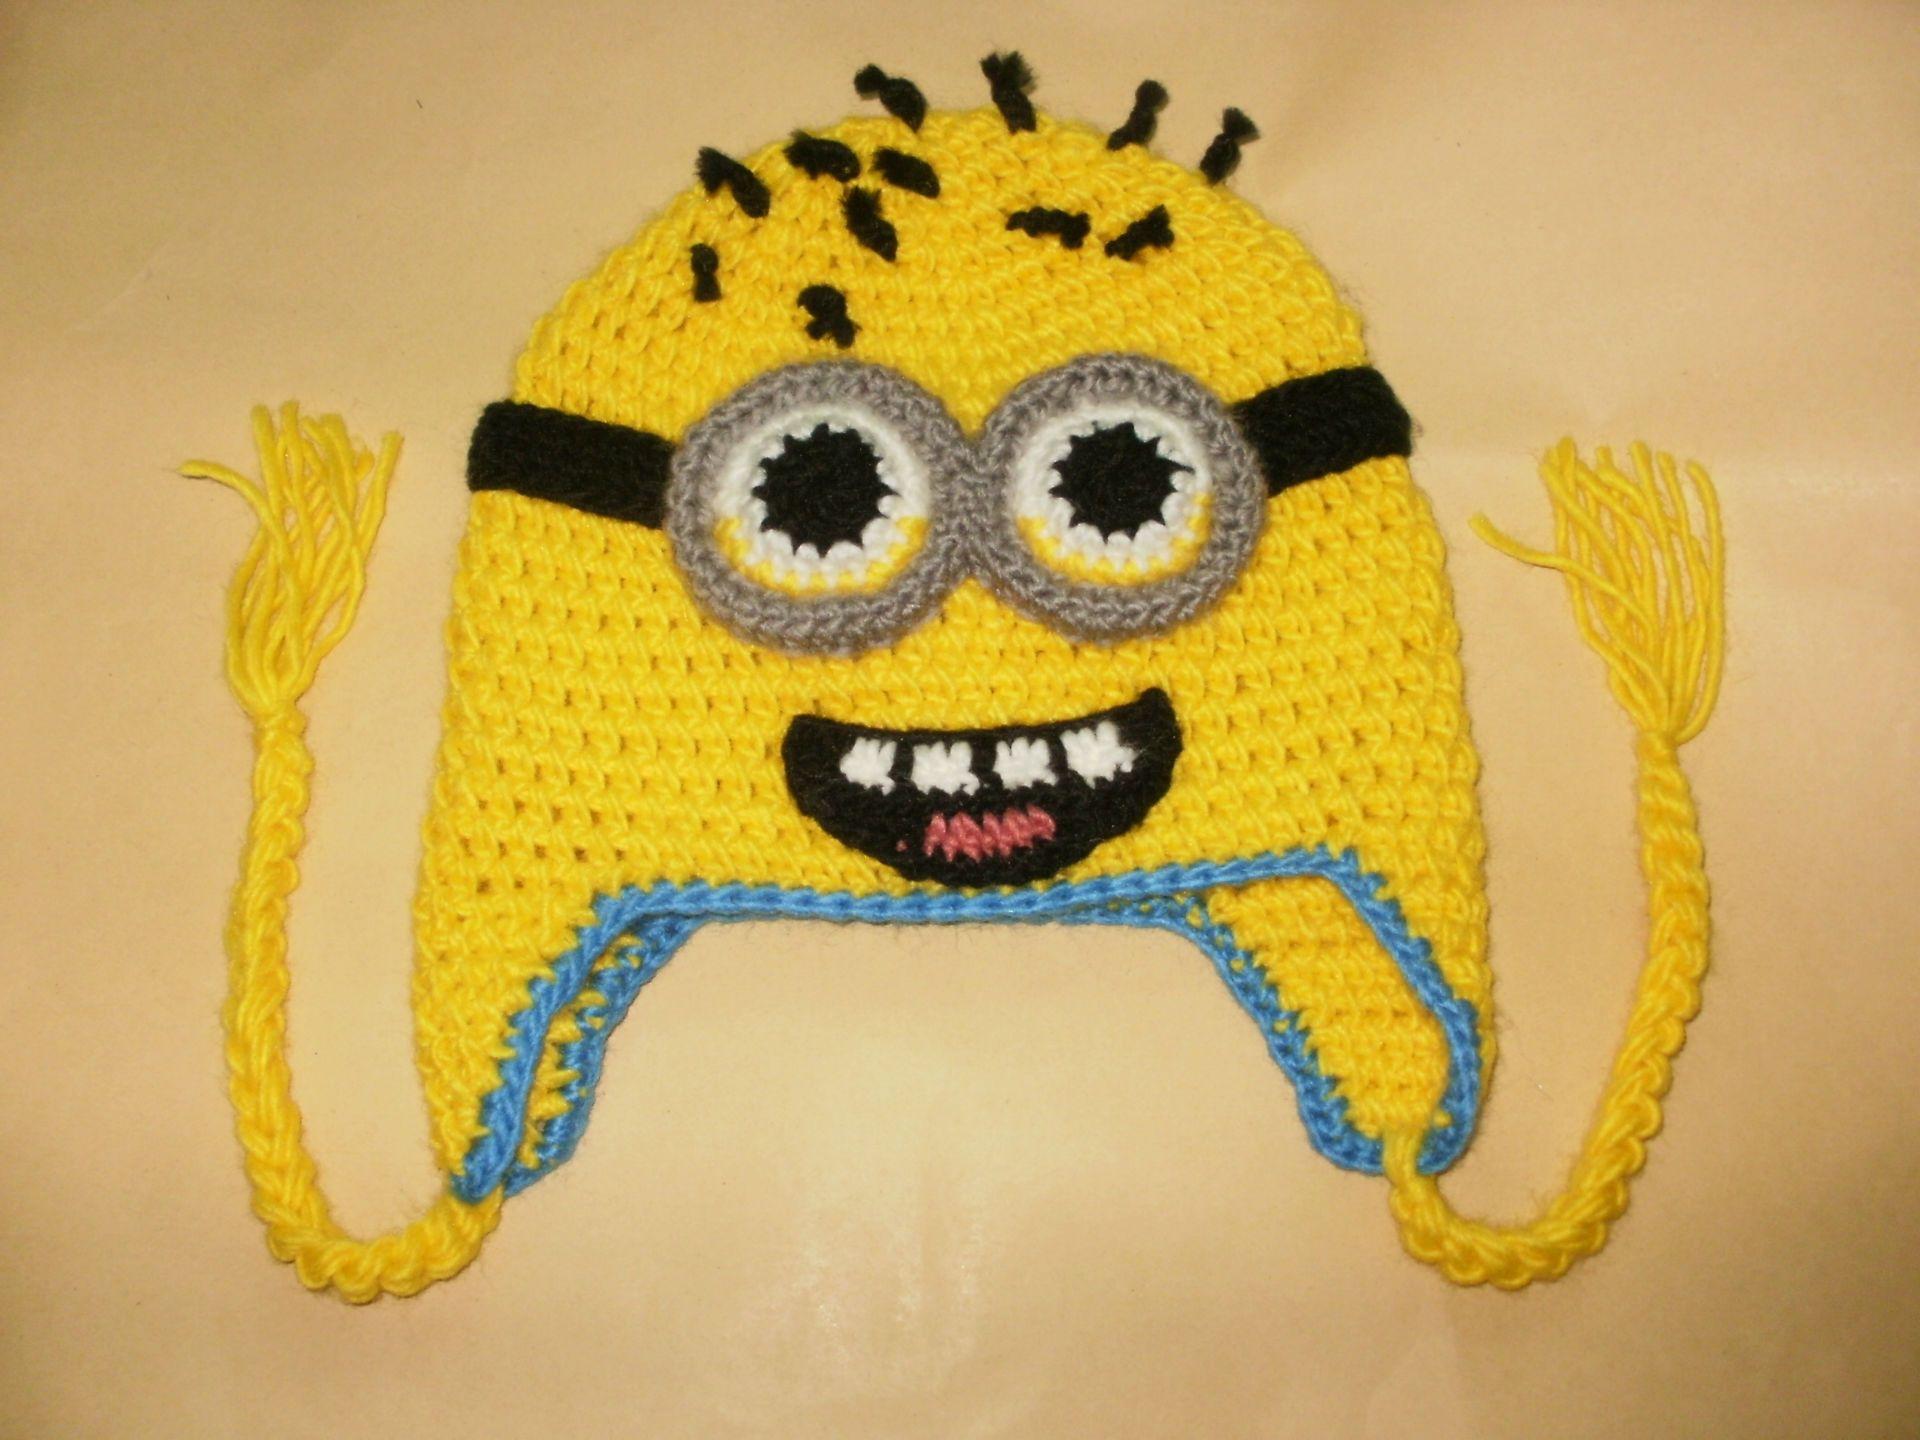 Knitting Pattern Minion Despicable Me Hat : Despicable Me Hat Knit Despicable Me Minion Hat Ear Flap Hat Handmade Crochet...